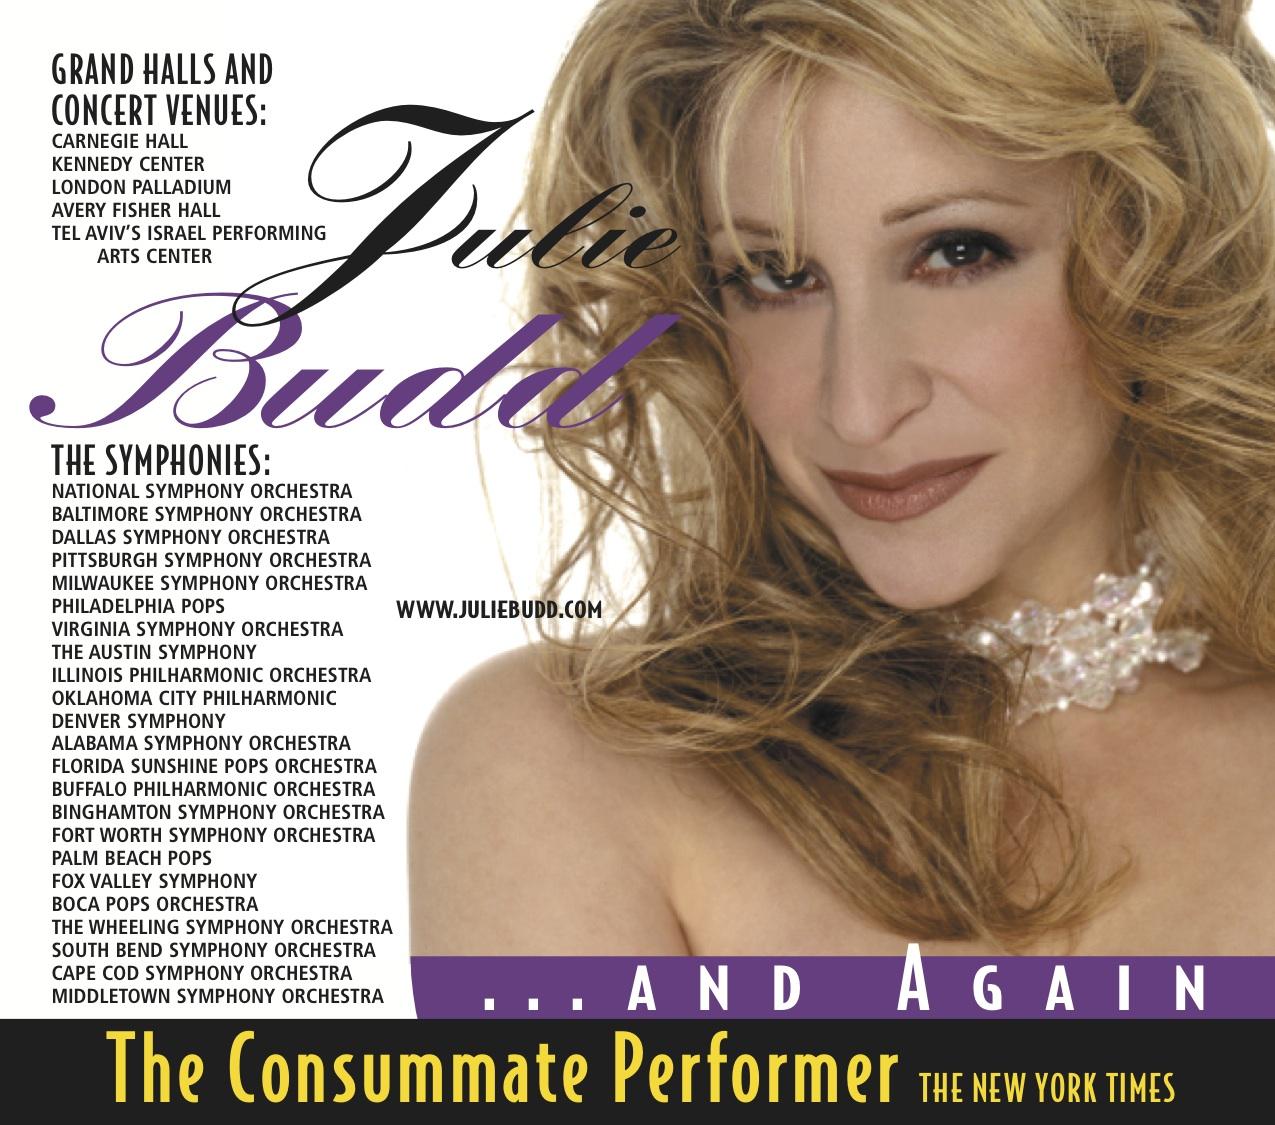 Julie Budd Tickets Benaroya Hall